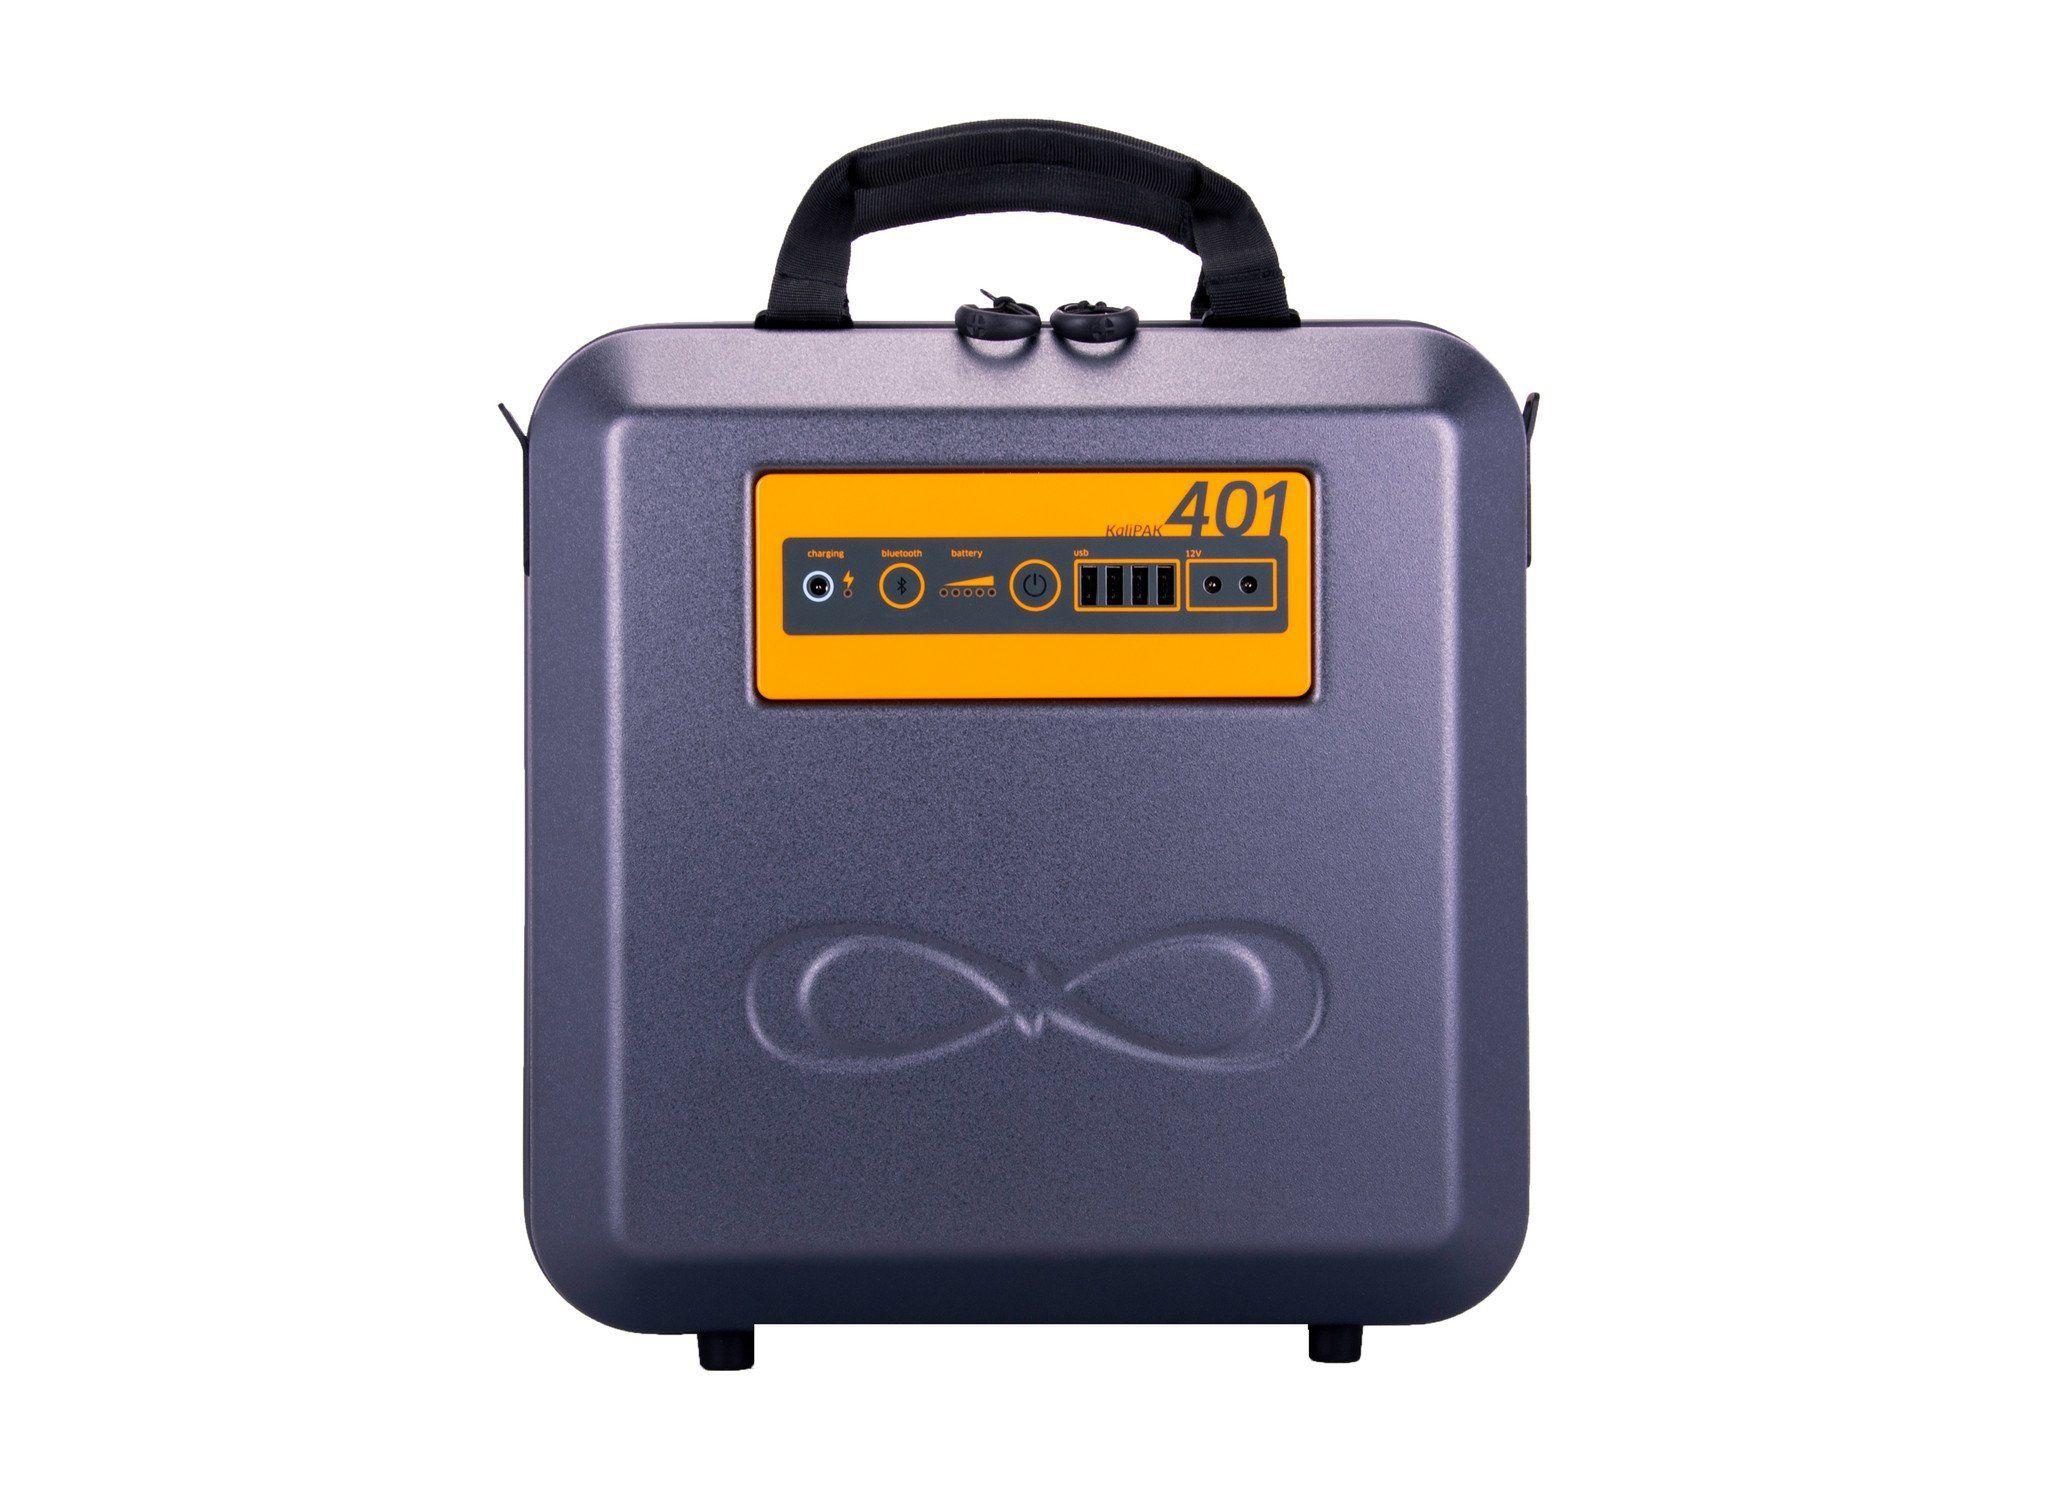 kalisaya kp401 kalipak 384 watt hour portable solar generator system